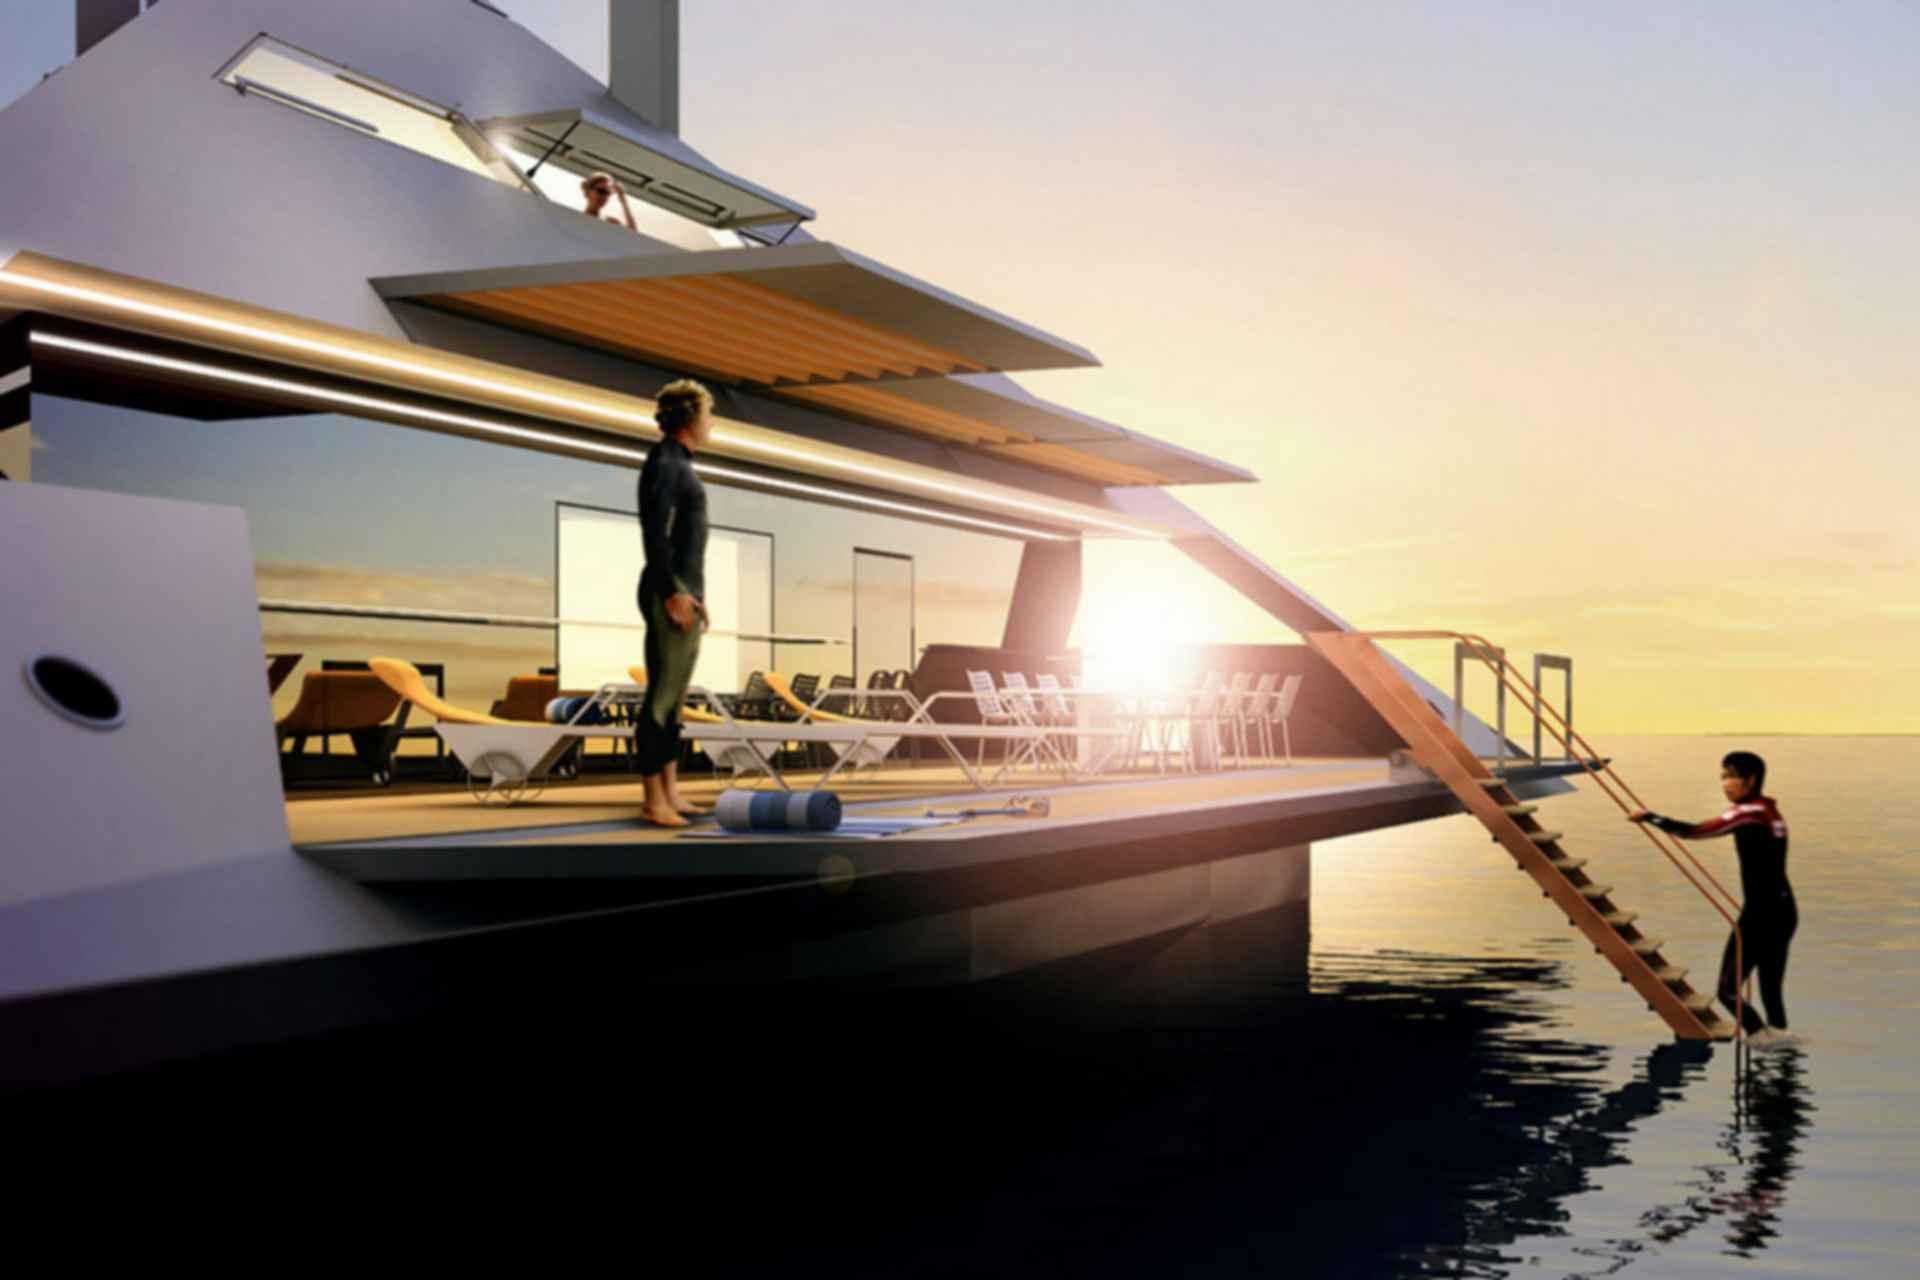 Schwinge Tetrahedron Superyacht - concept design